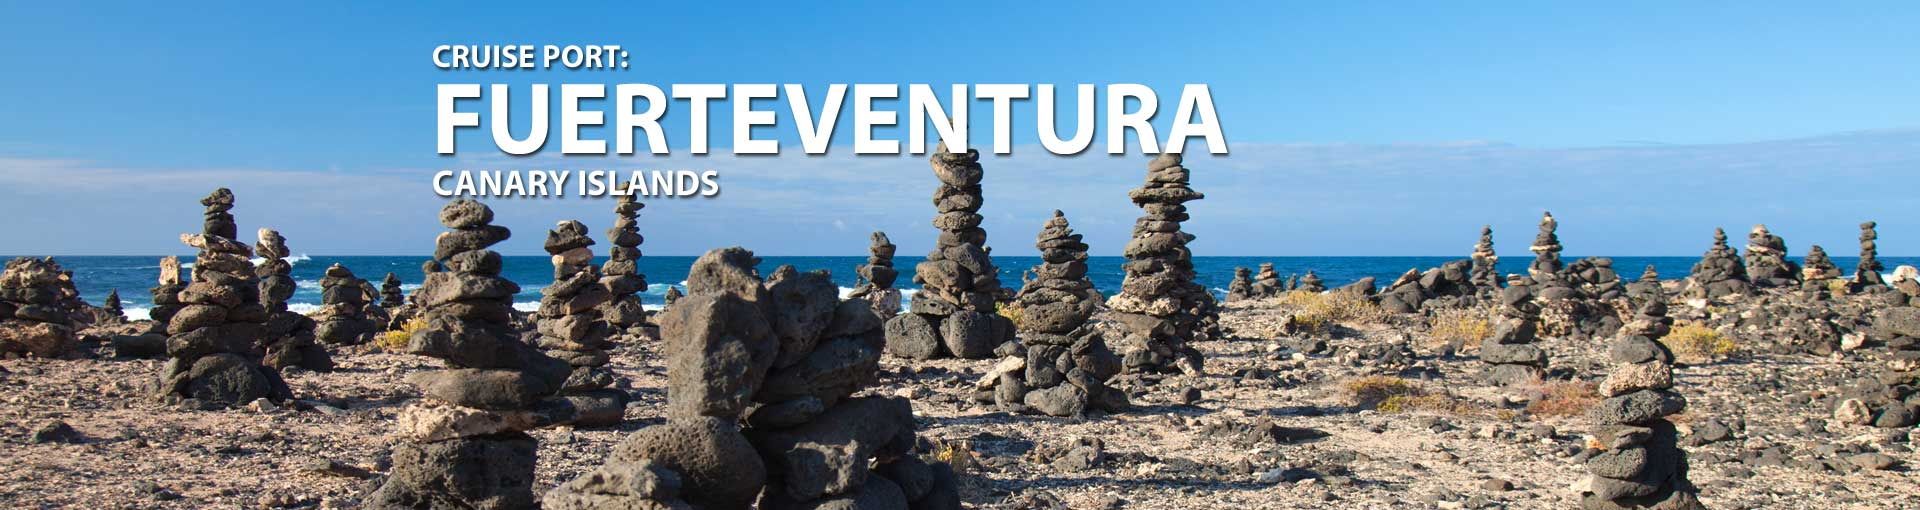 Cruises to Fuerteventura, Canary Islands